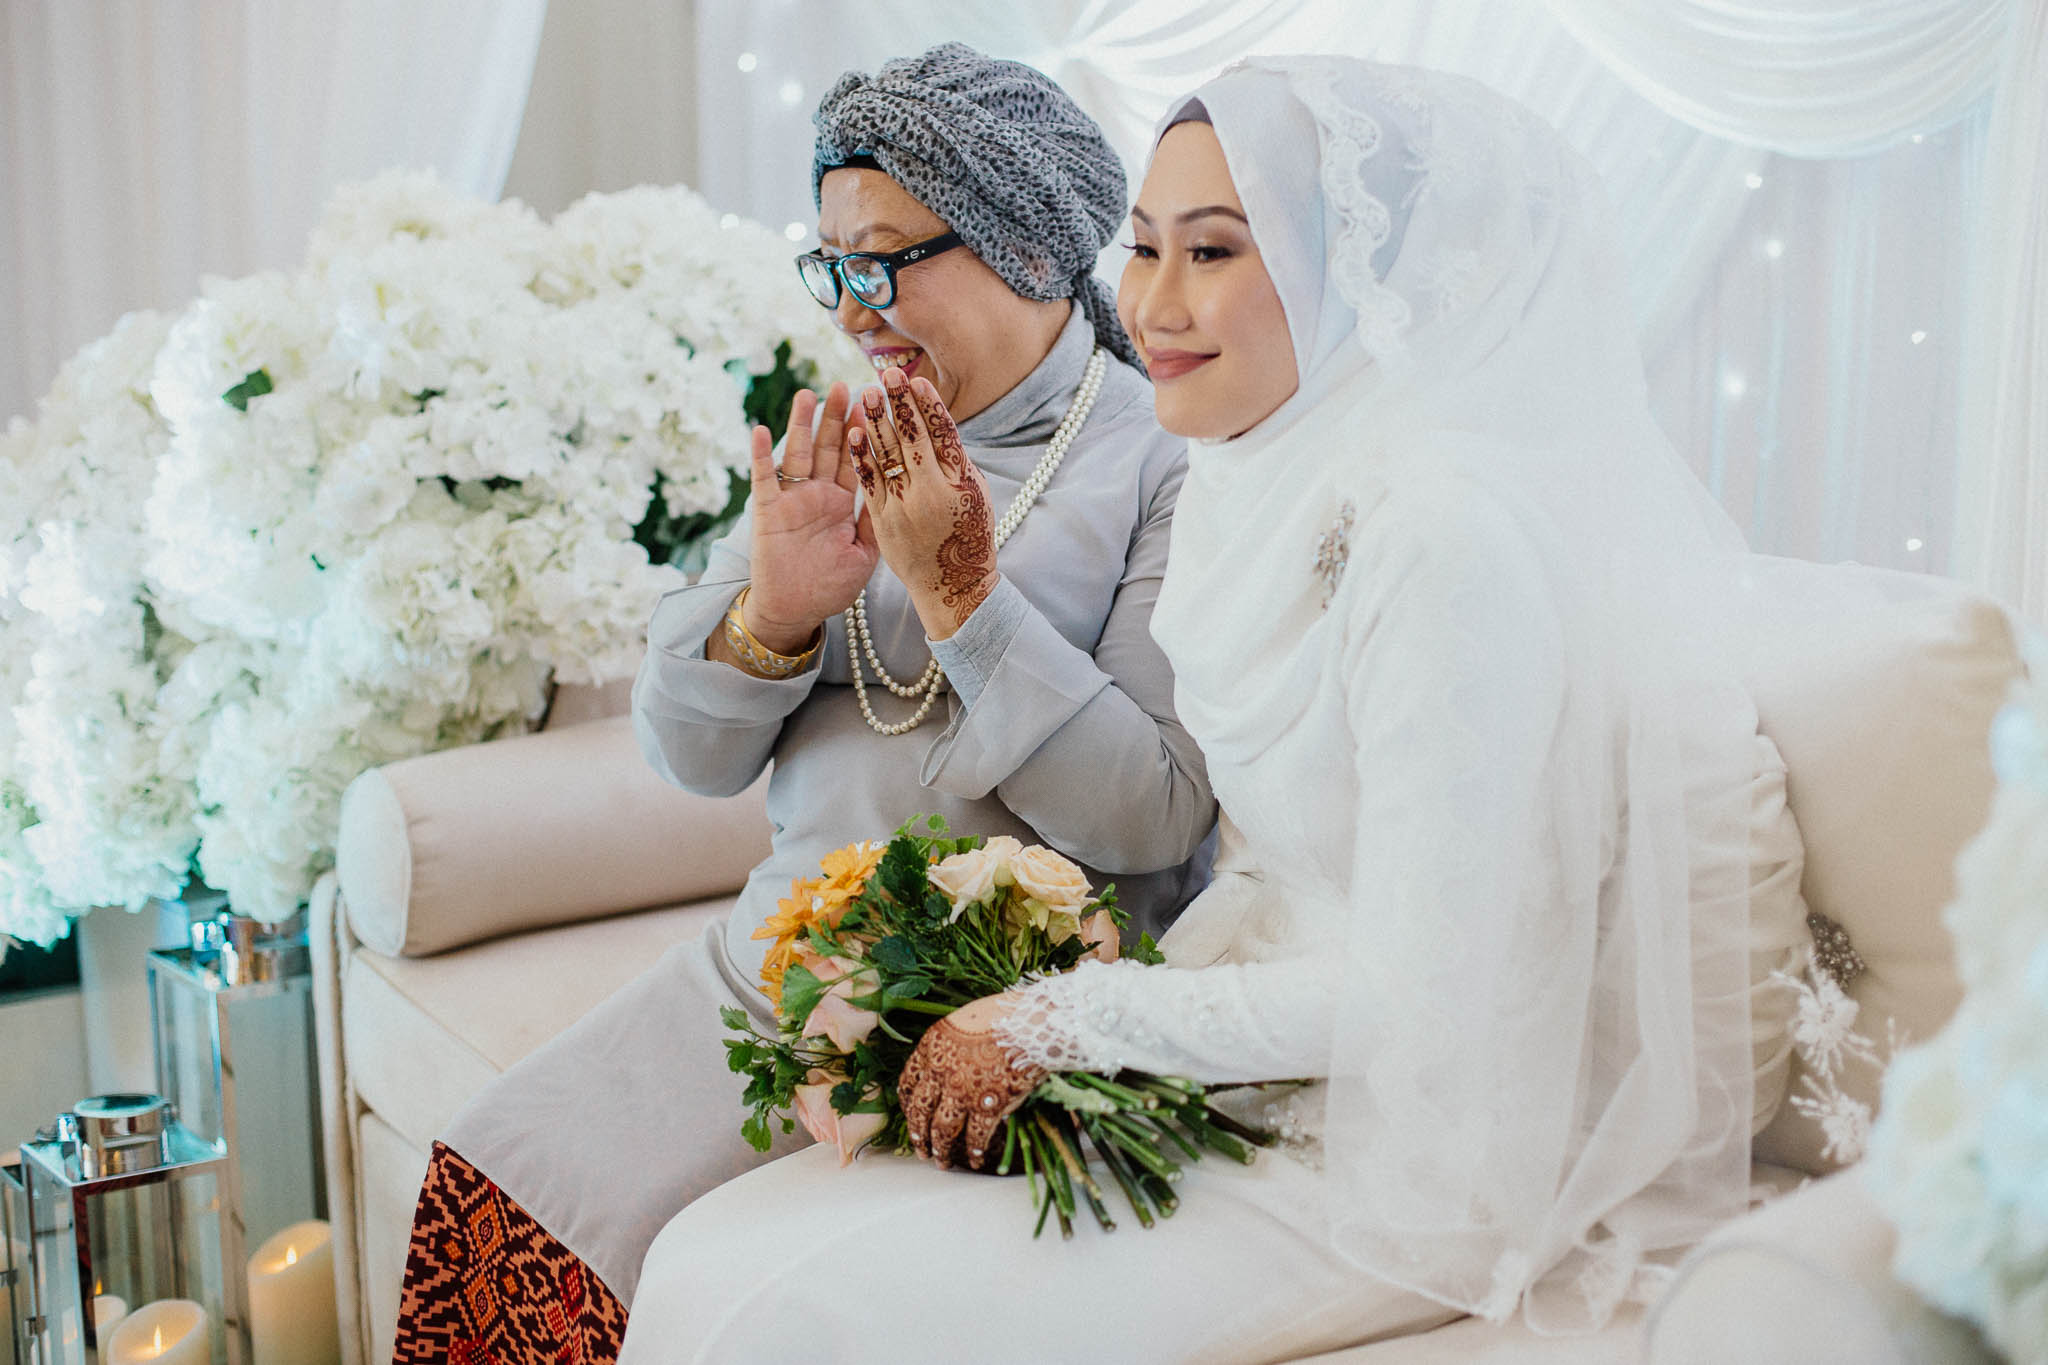 singapore-wedding-photographer-wedding-nufail-addafiq-022.jpg